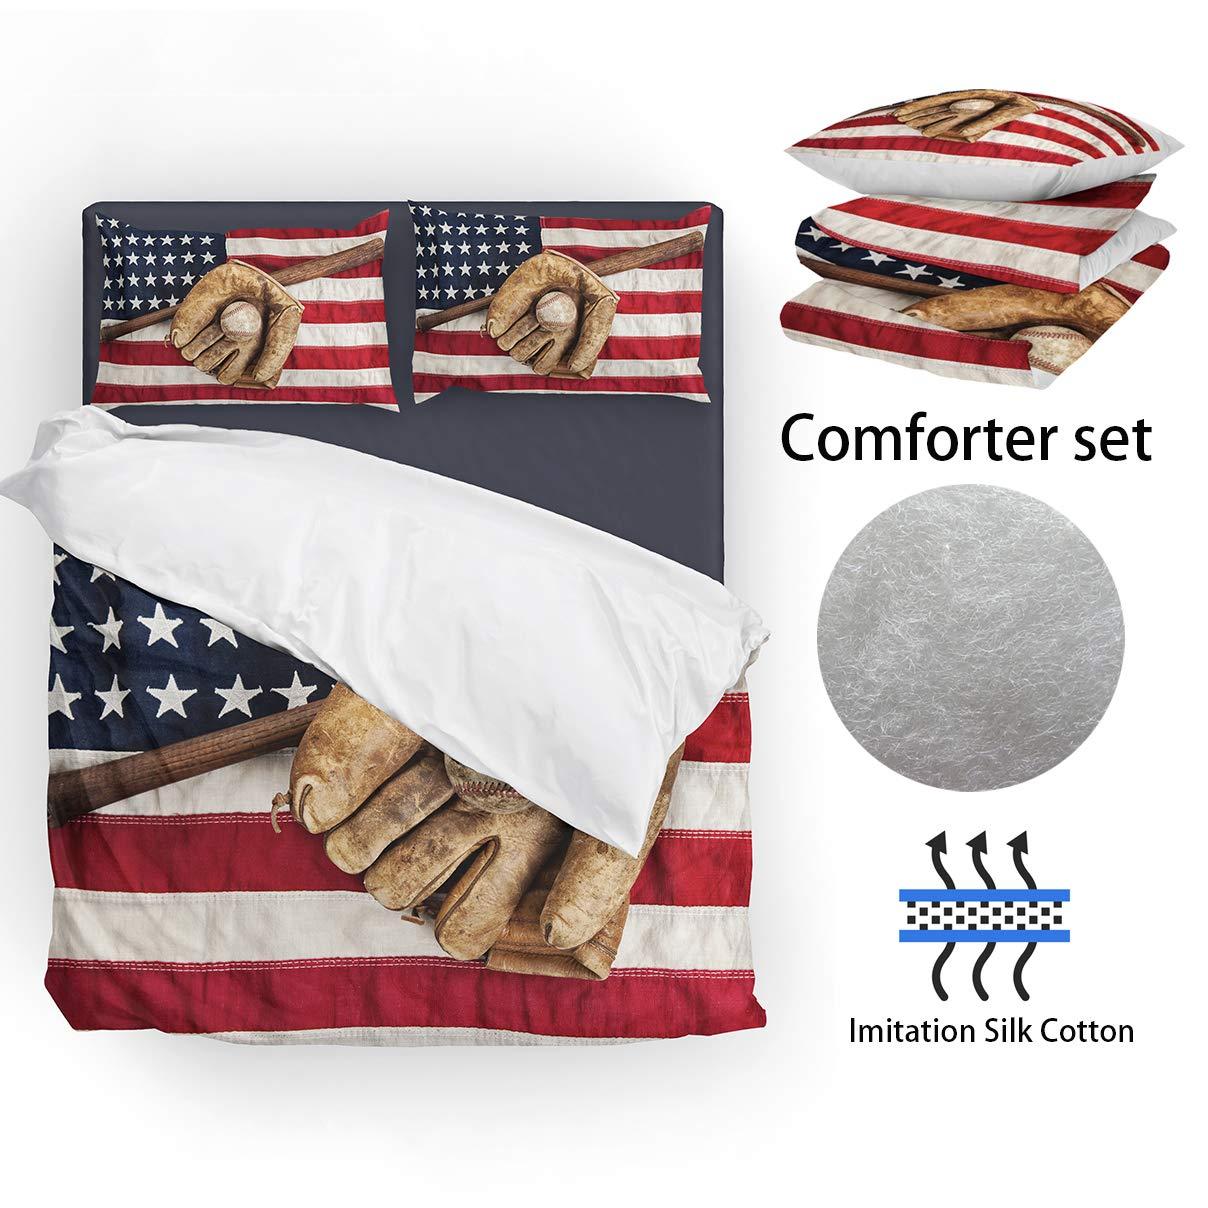 SHINICHISTAR American Flag Baseball Comforter Set for Teens Full Size Sports BOY Bedding Set